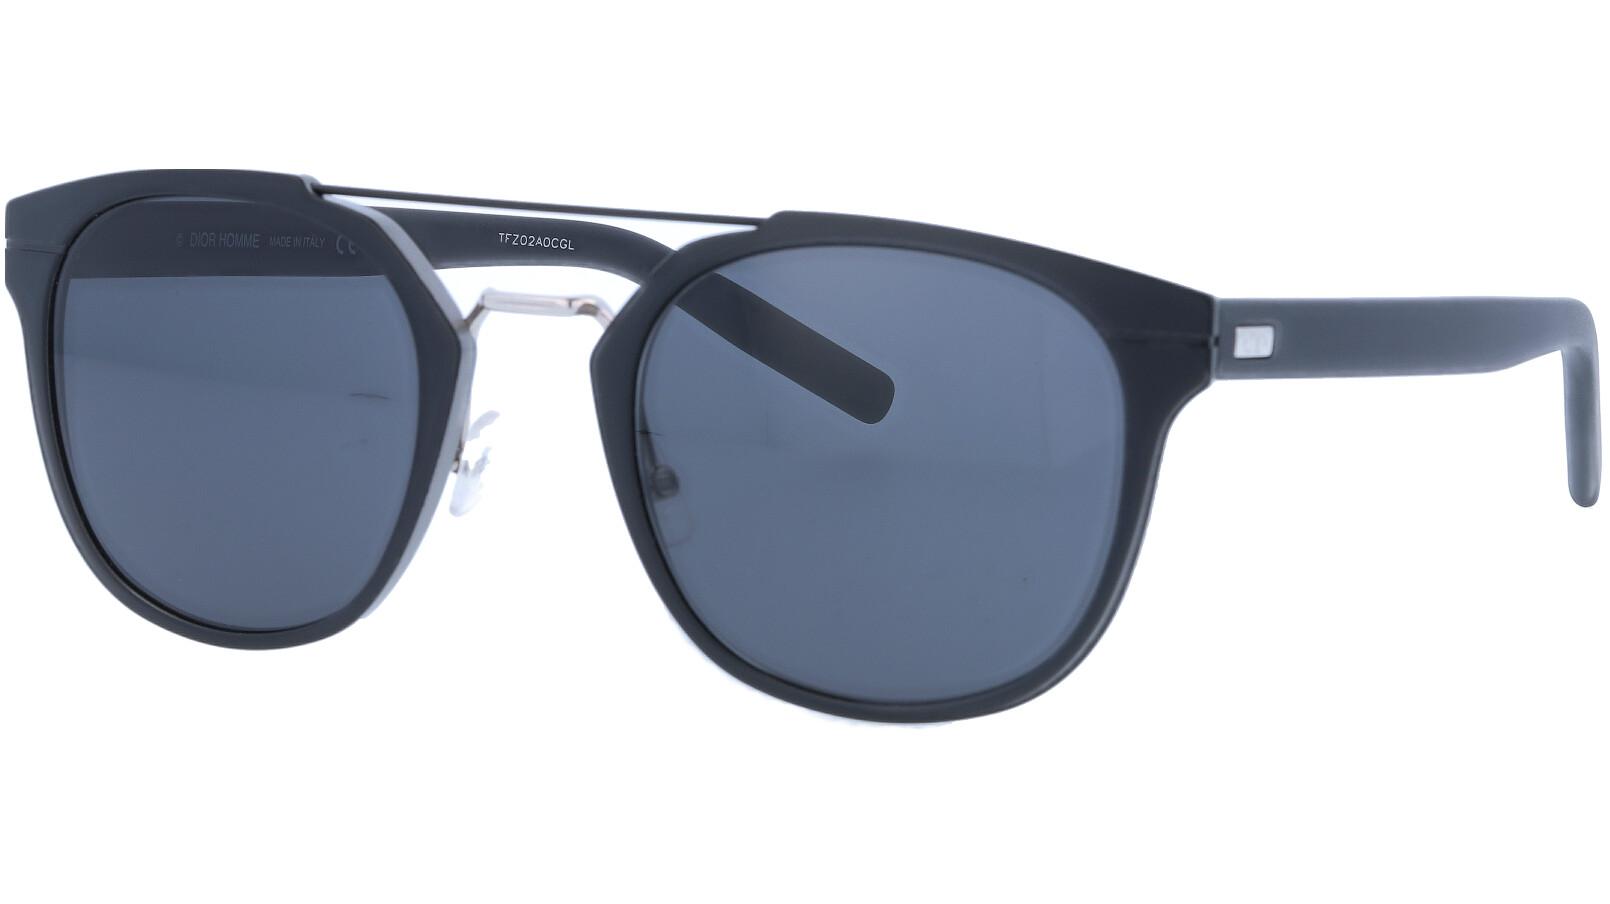 DIOR DIORAL13.5 GAN72 52 BLALLUGRY Sunglasses